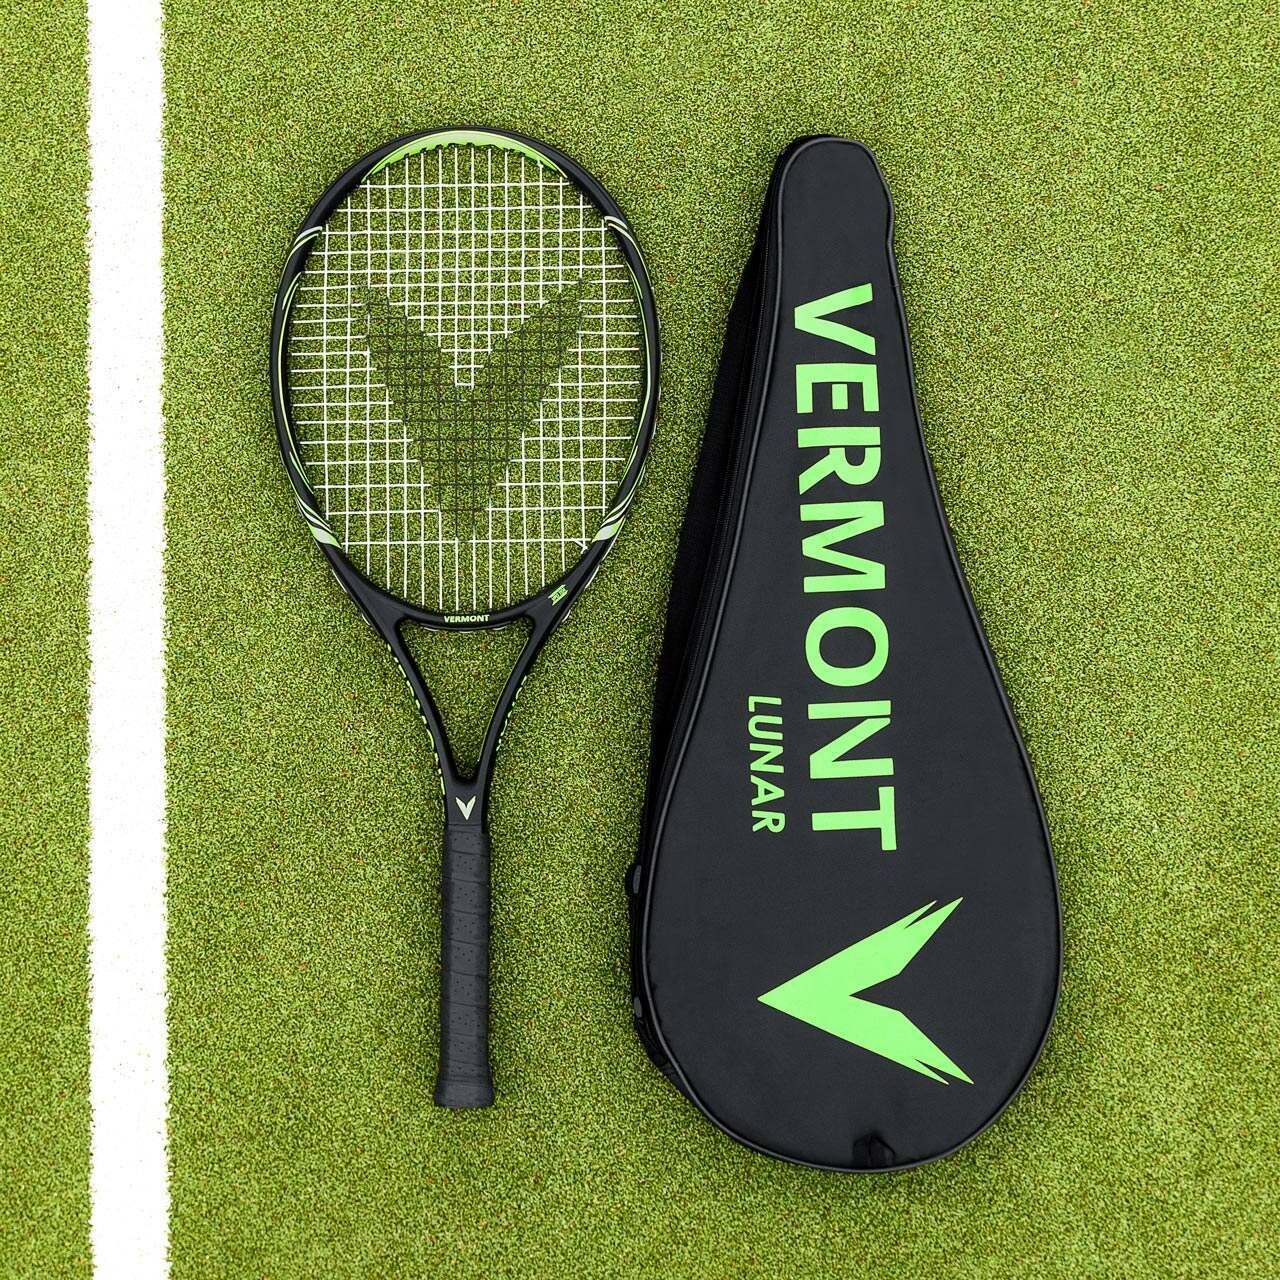 Vermont Lunar Tennis Racket